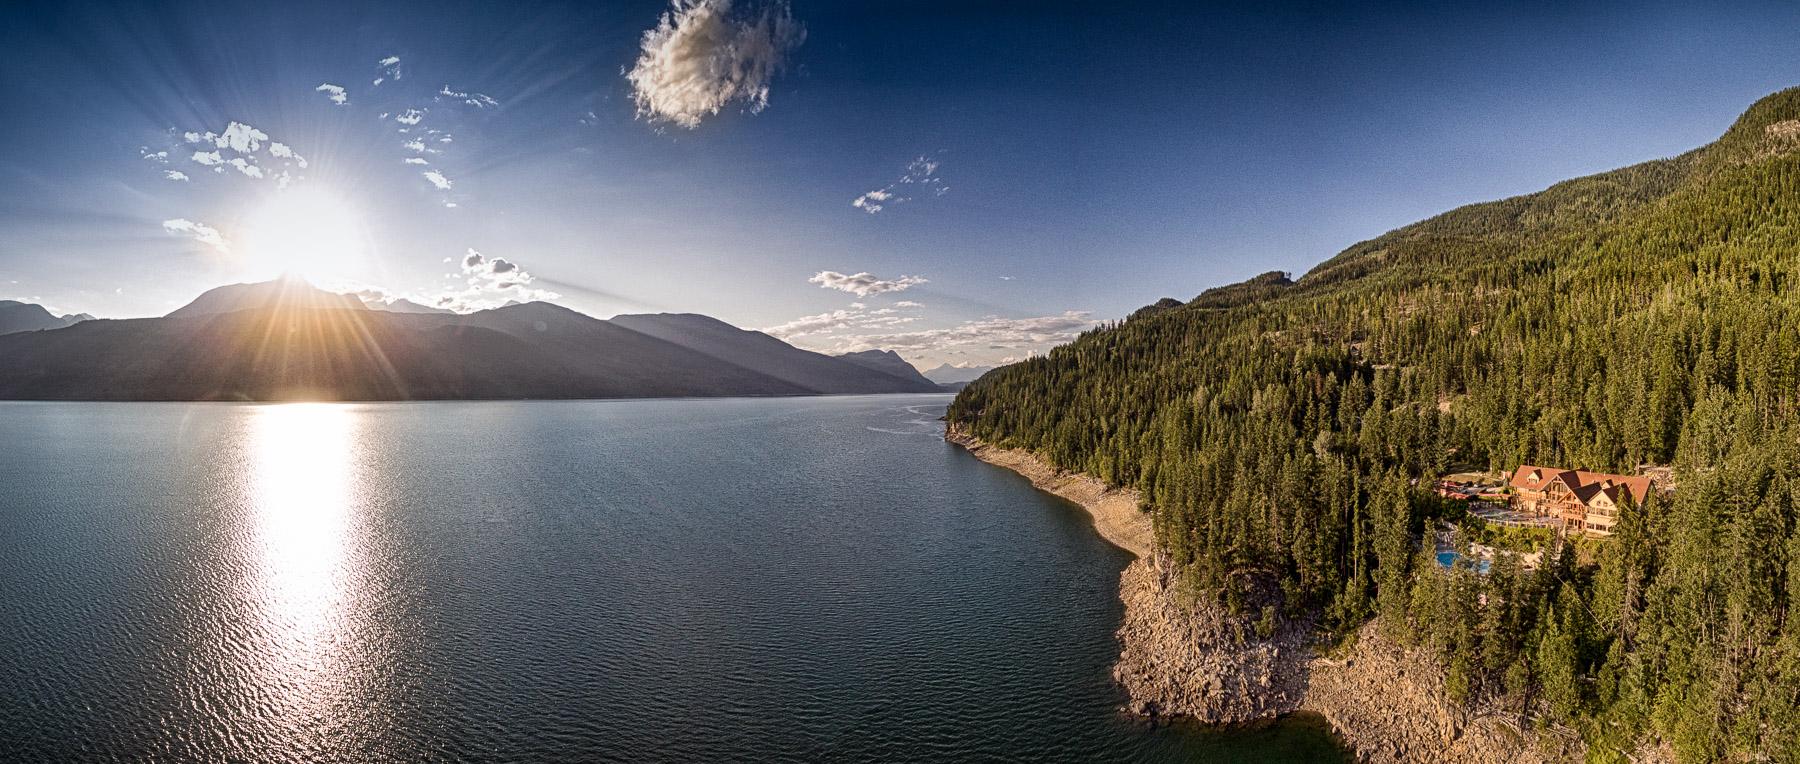 Lake and Mountain Views at Halcyon Hot Springs